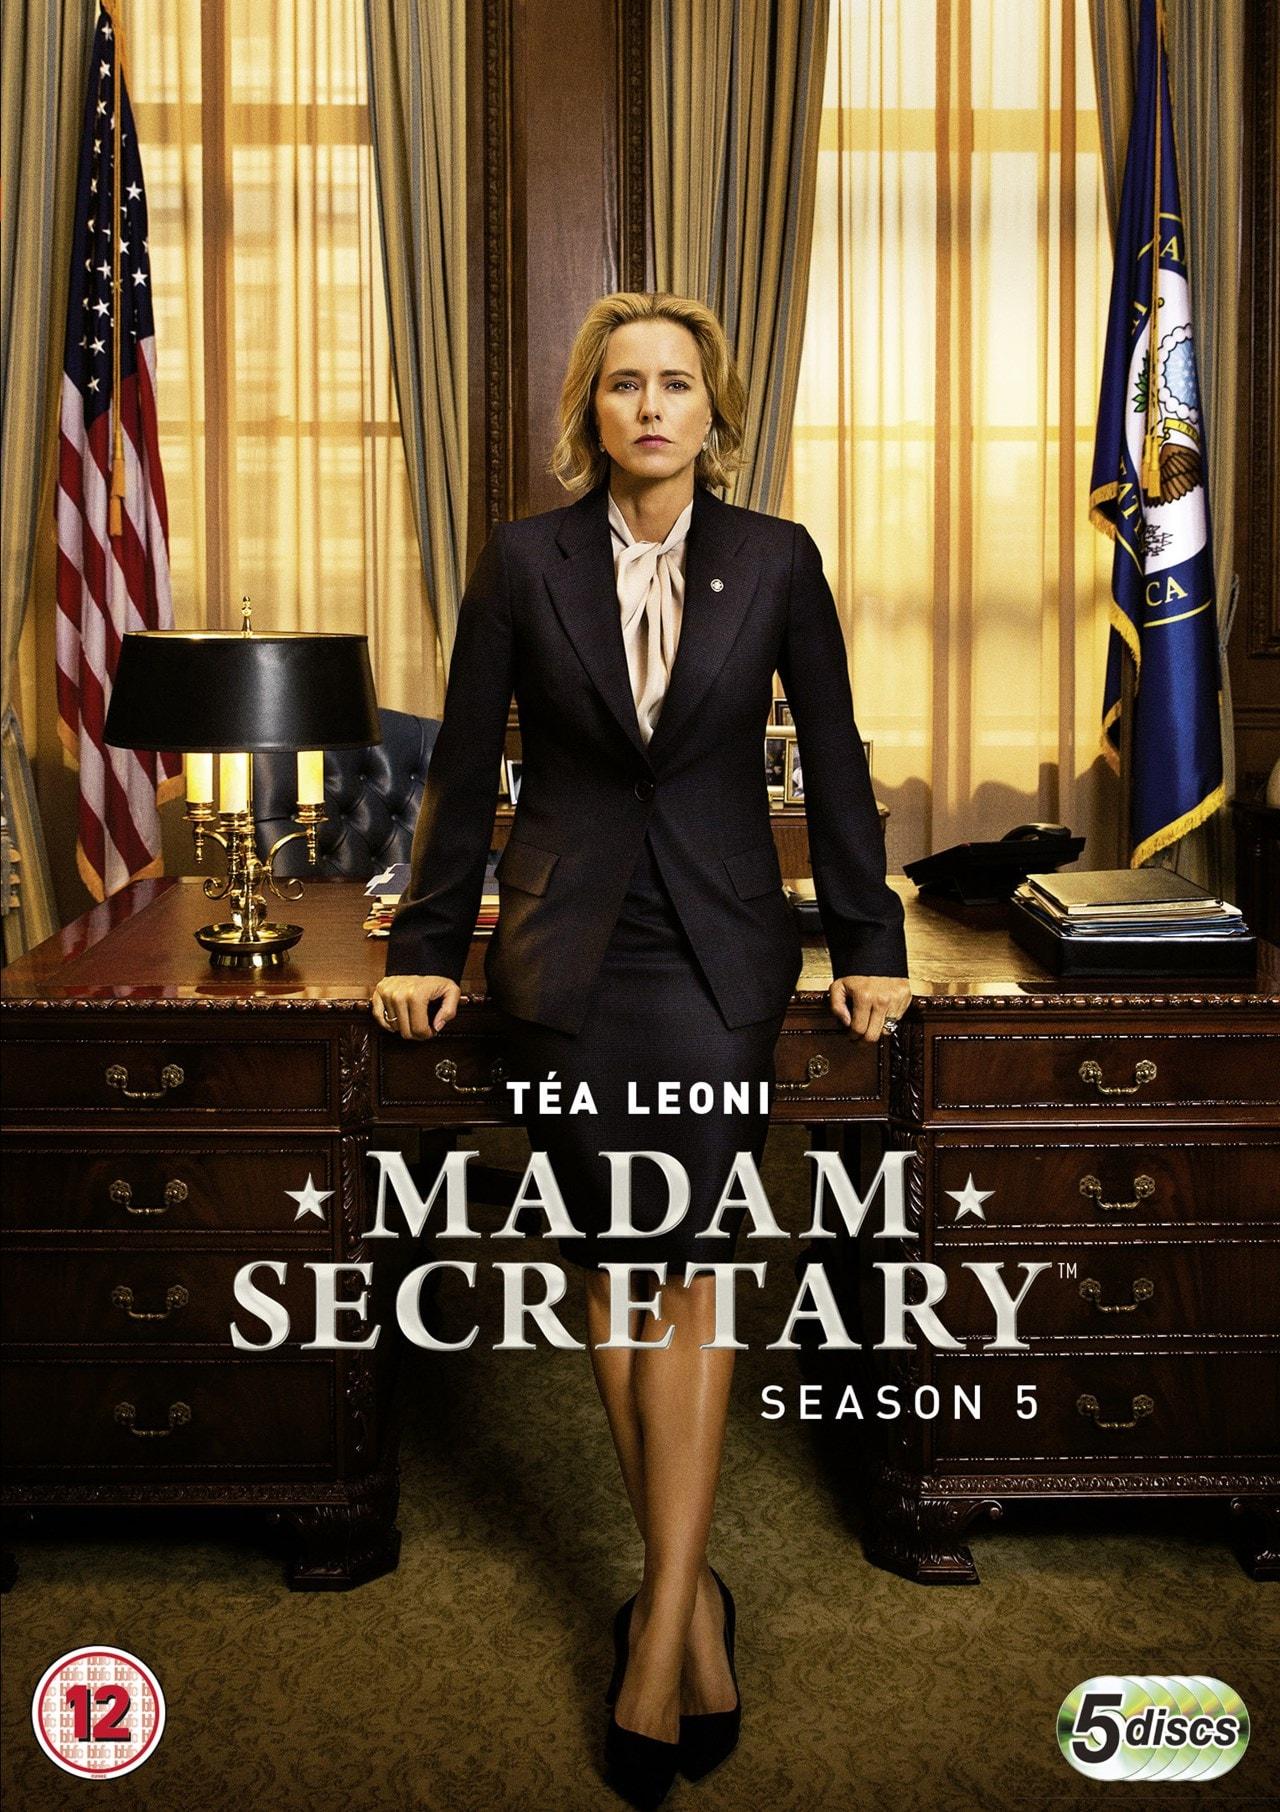 Madam Secretary: Season 5 - 1